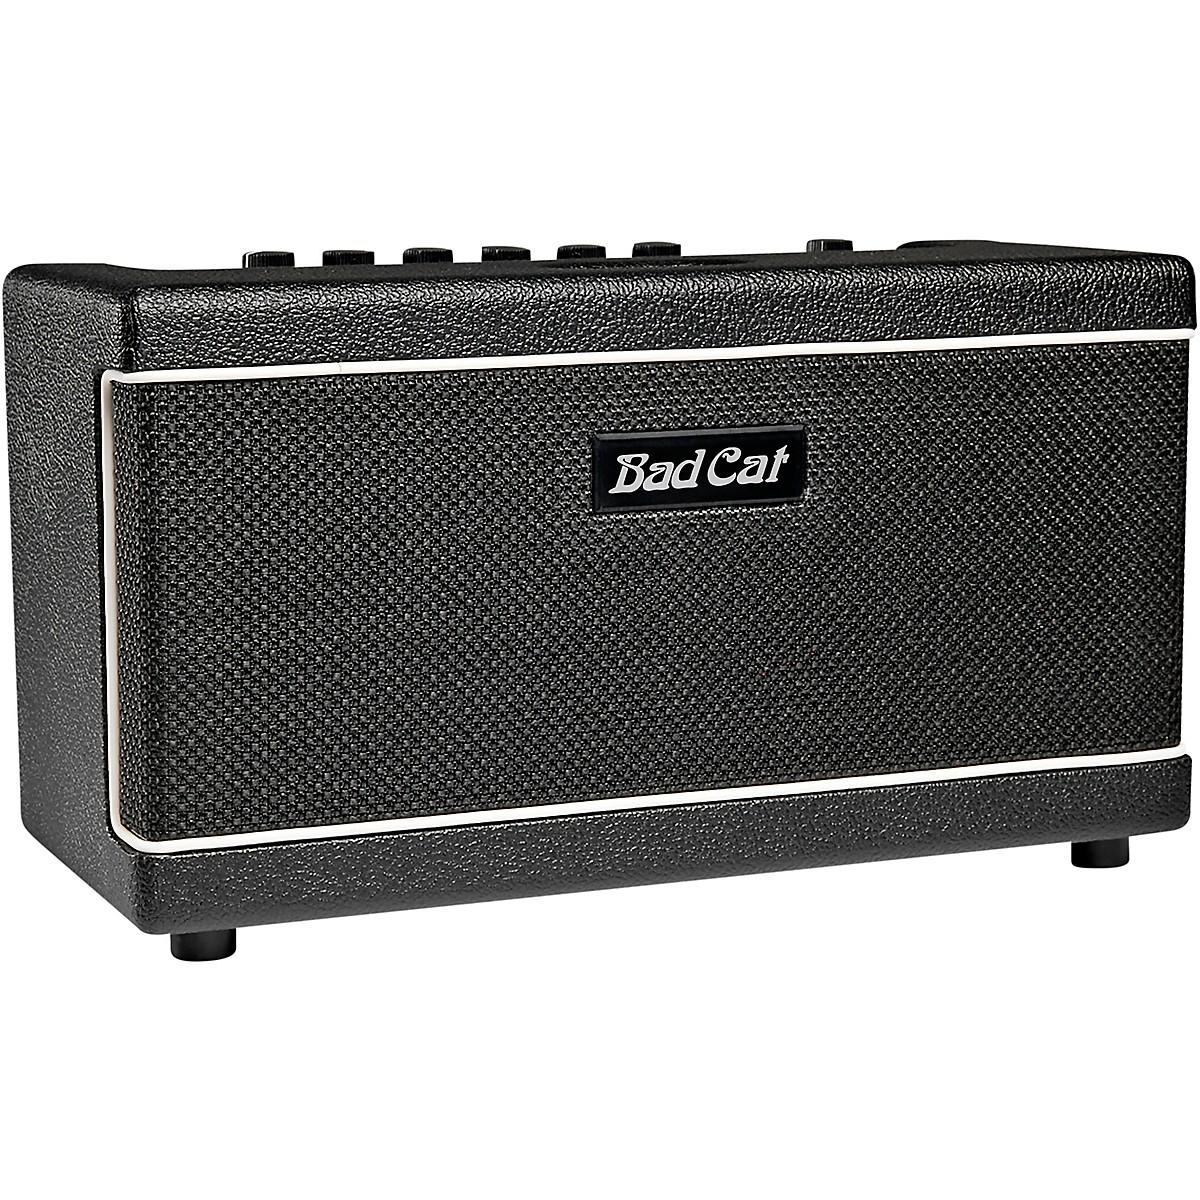 Bad Cat Paw 60w 2x6 Tube Hybrid Guitar Combo Amp Black Guitar Center